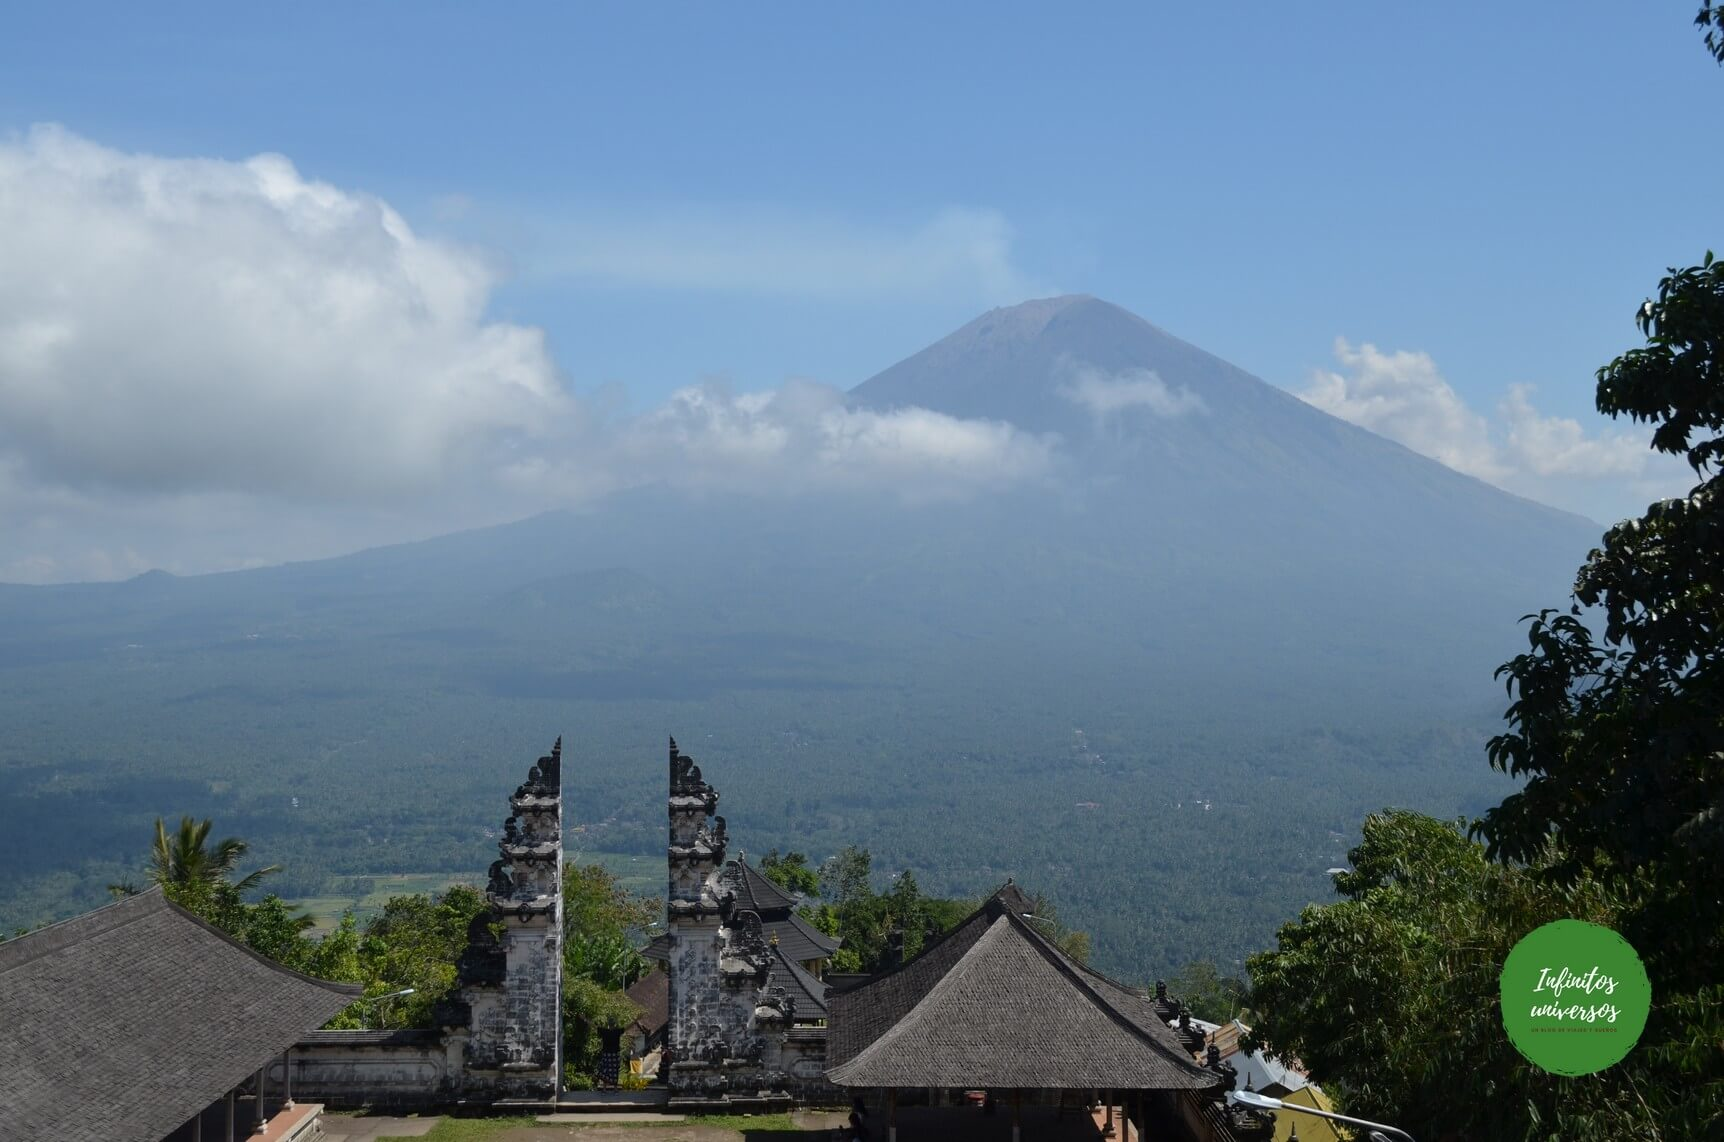 Pura Lempuyang Luhur bali - Qué ver en Bali (Indonesia)